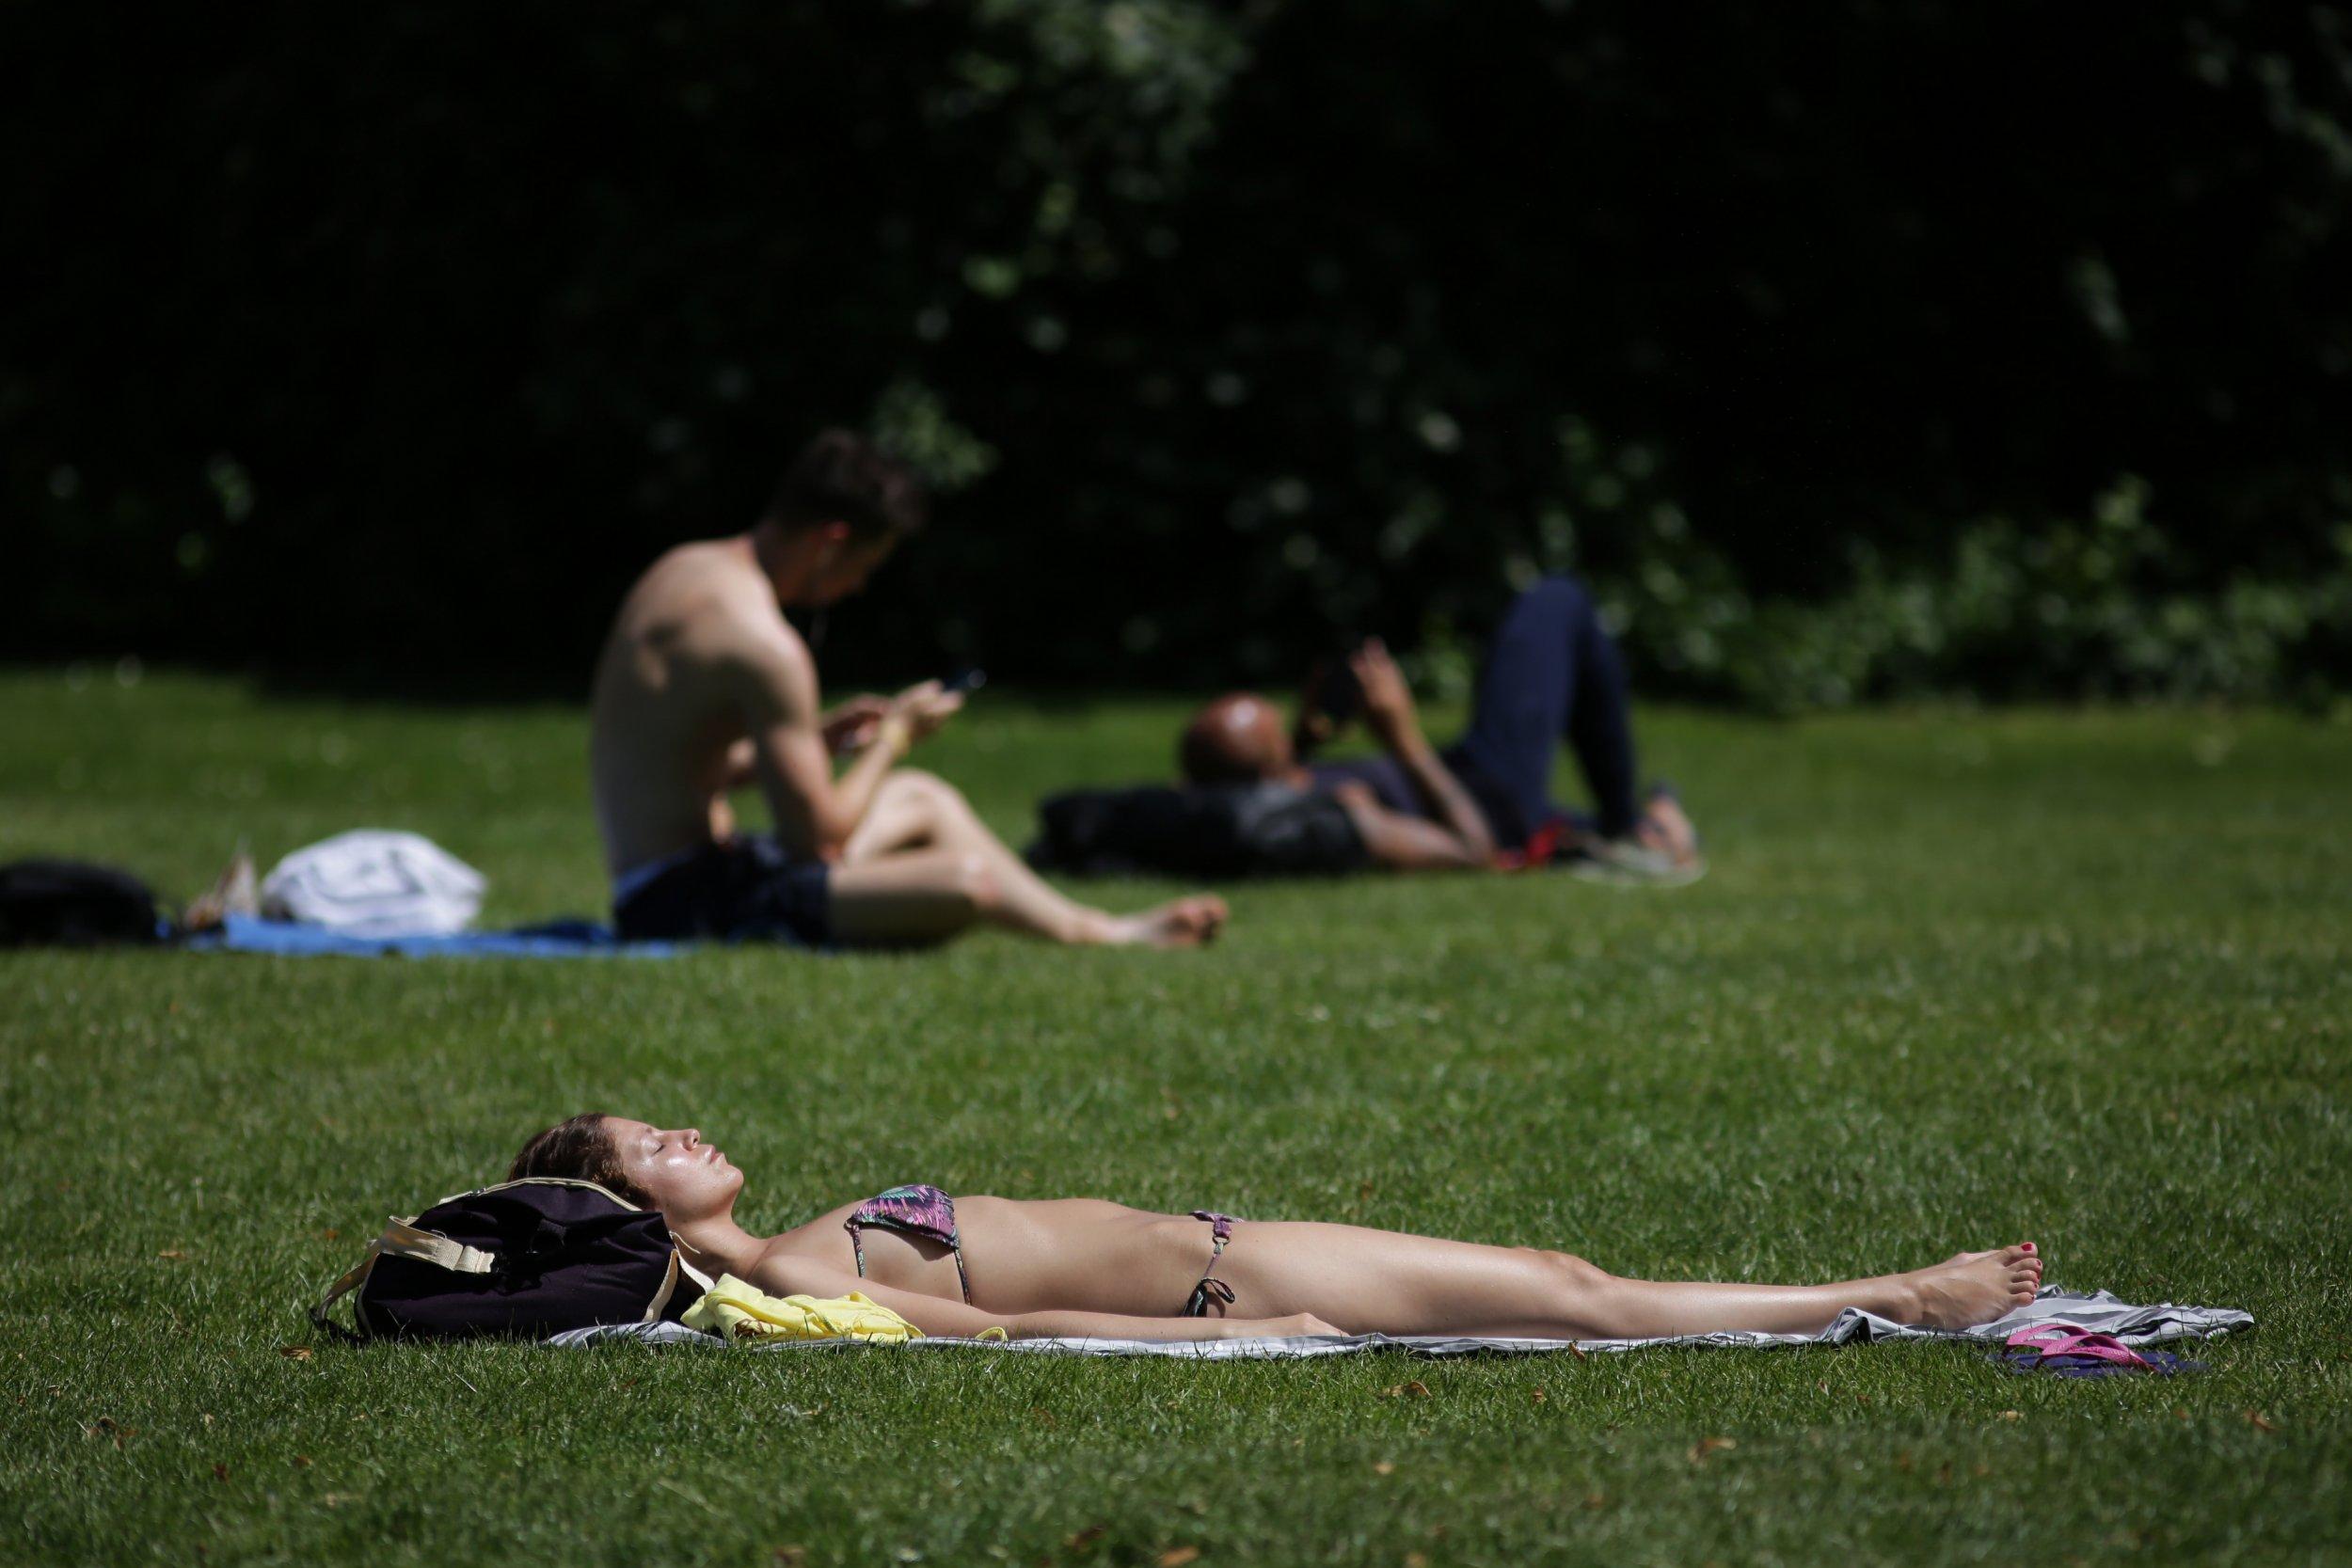 Weather, London heatwave